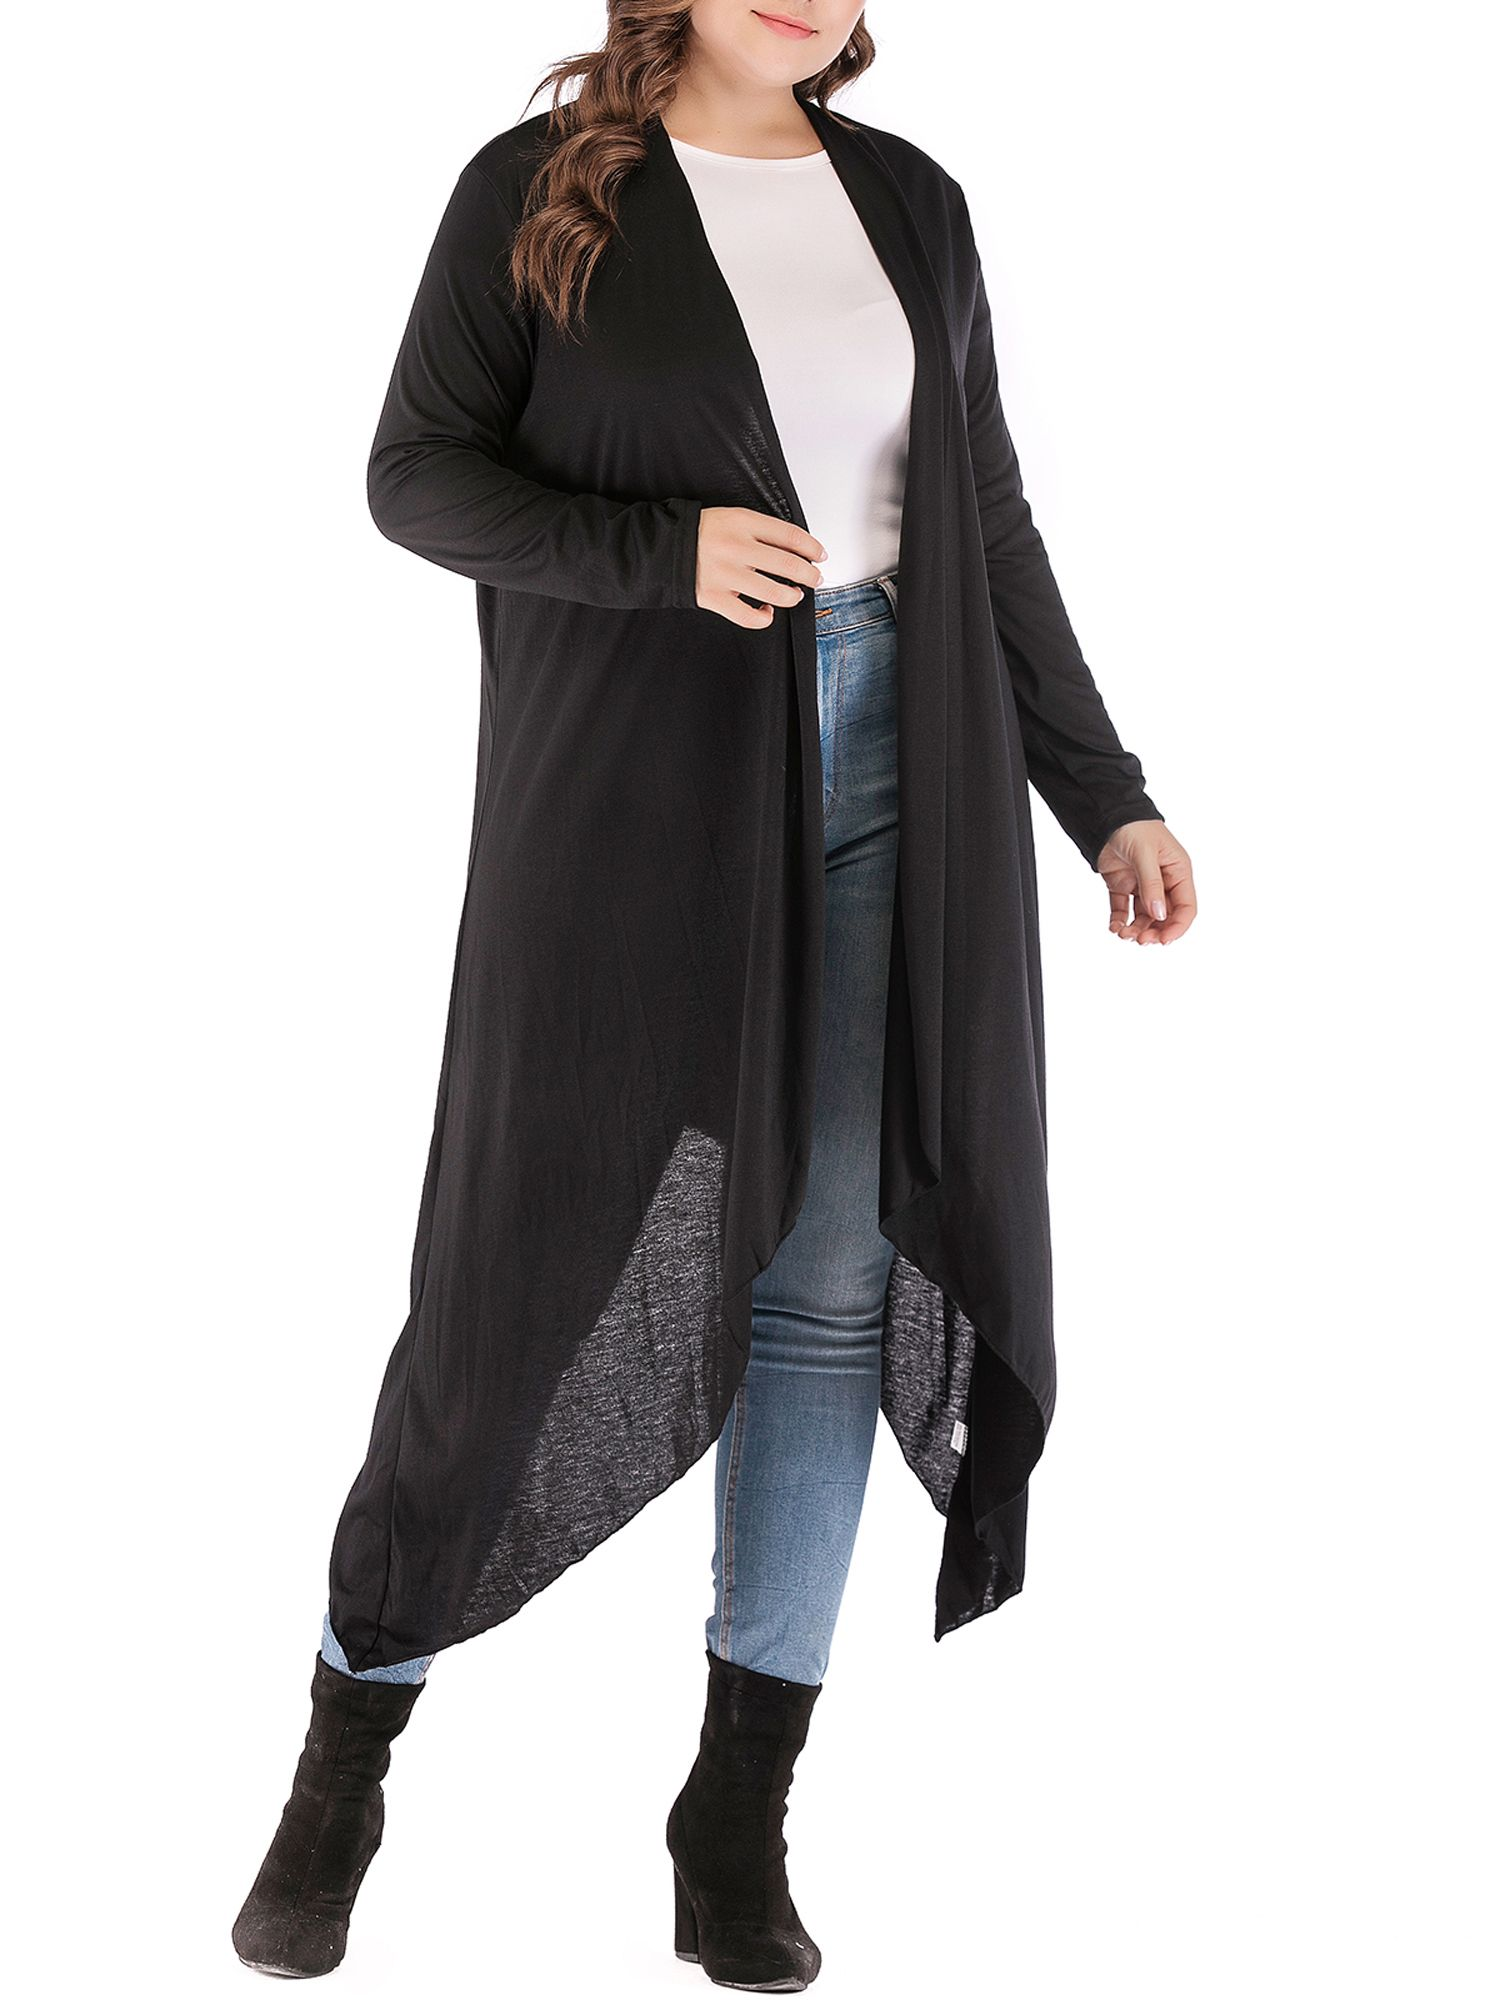 LELINTA Plus Size Cardigan Lightweight Sweaters for Women Long Asymmetrical Hem Cardigan Sweater Cover-up Black Kimono Cardigan Thin Tops | savingfashioncost.com 2